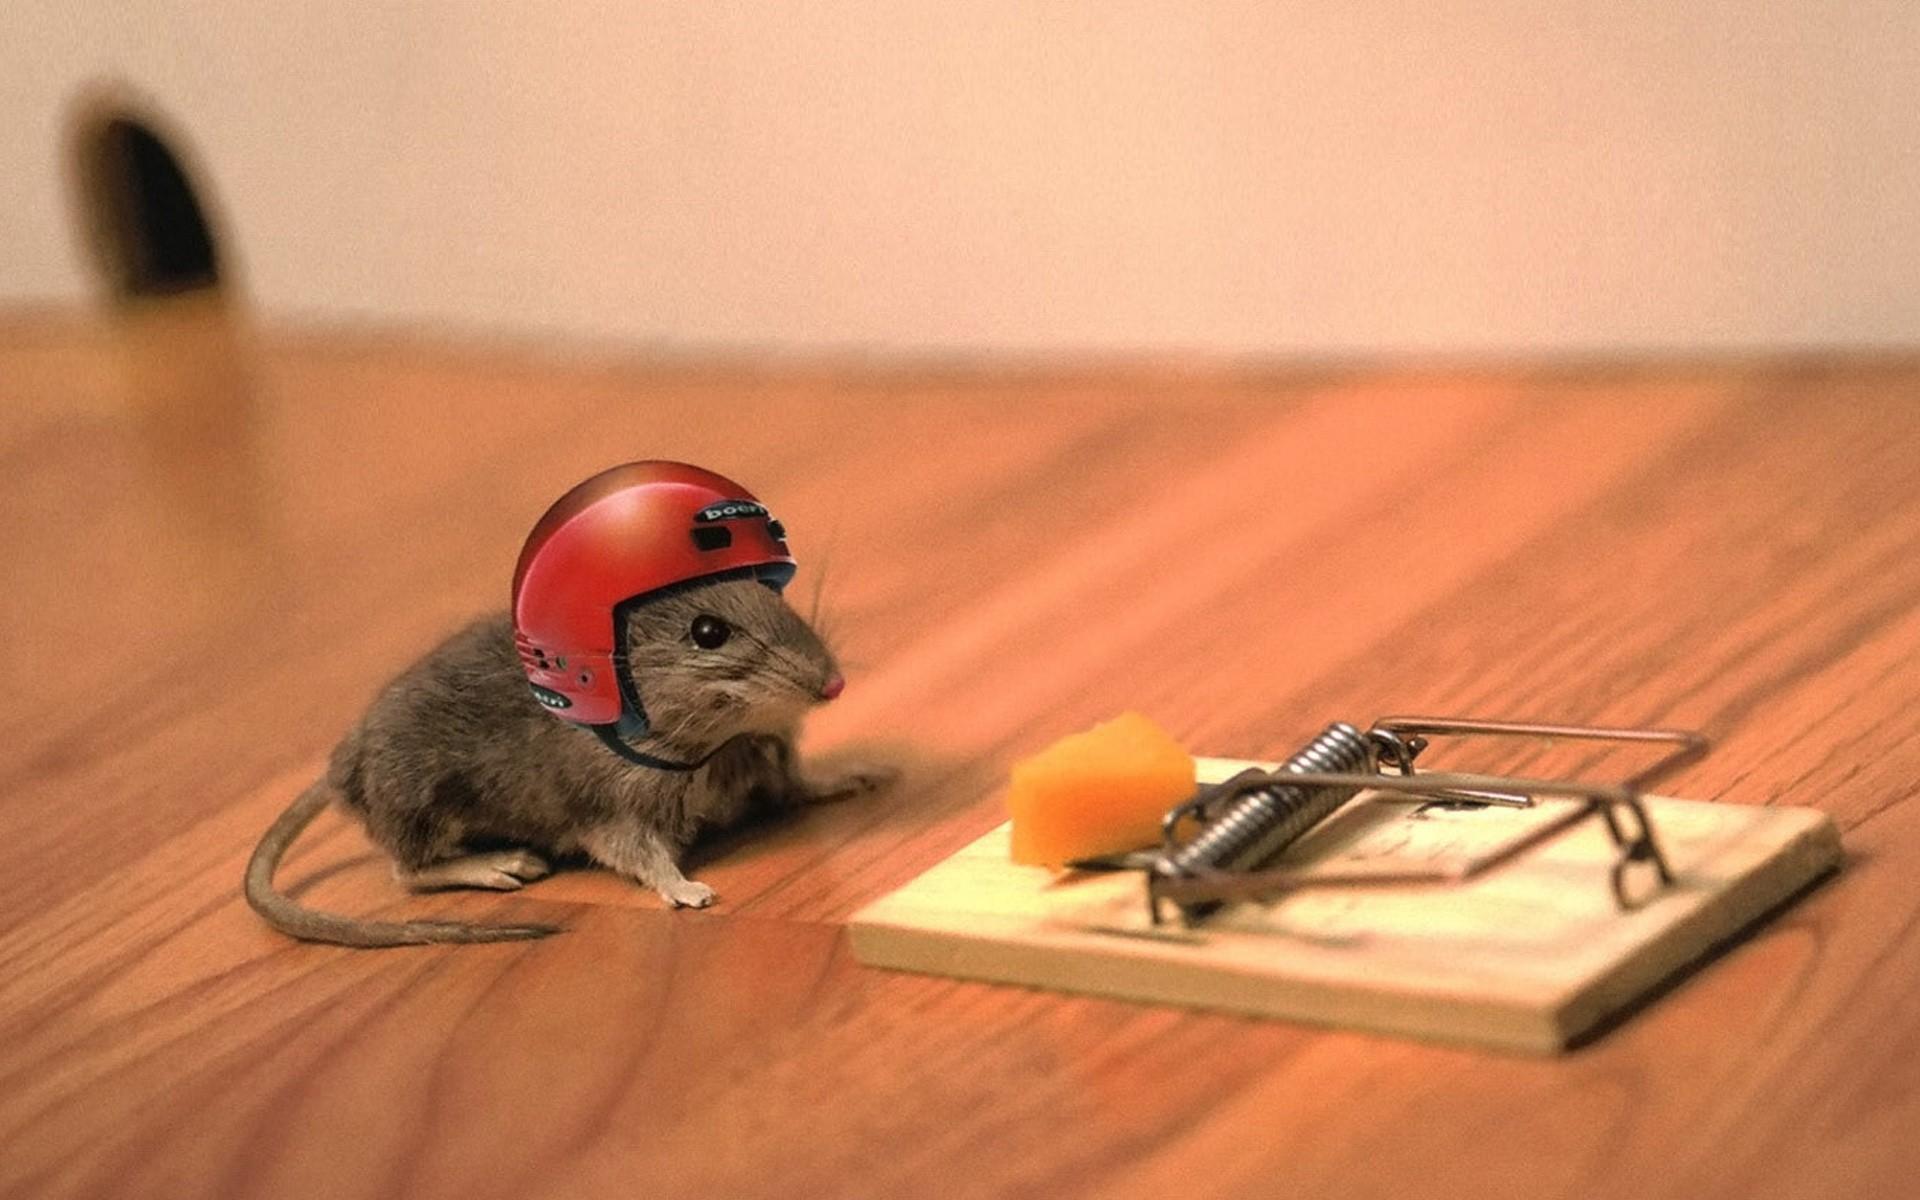 animals_helmets_mouse_trap_mice_1920x1200.jpg